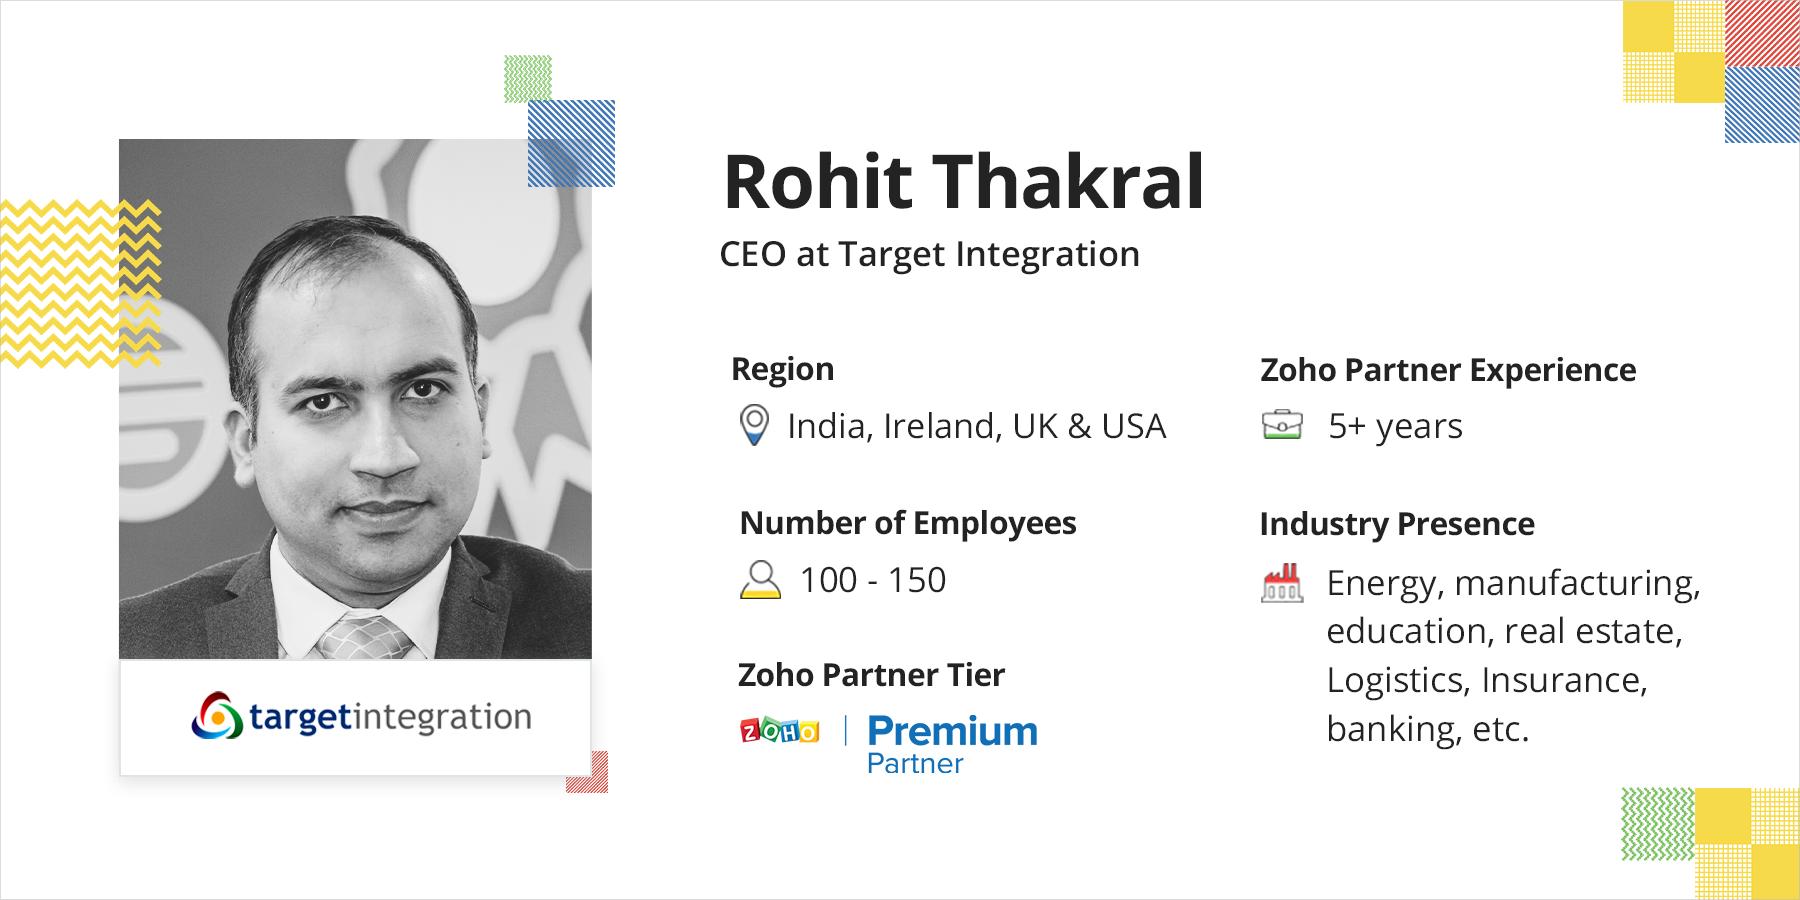 The Partner profile of Target Integration